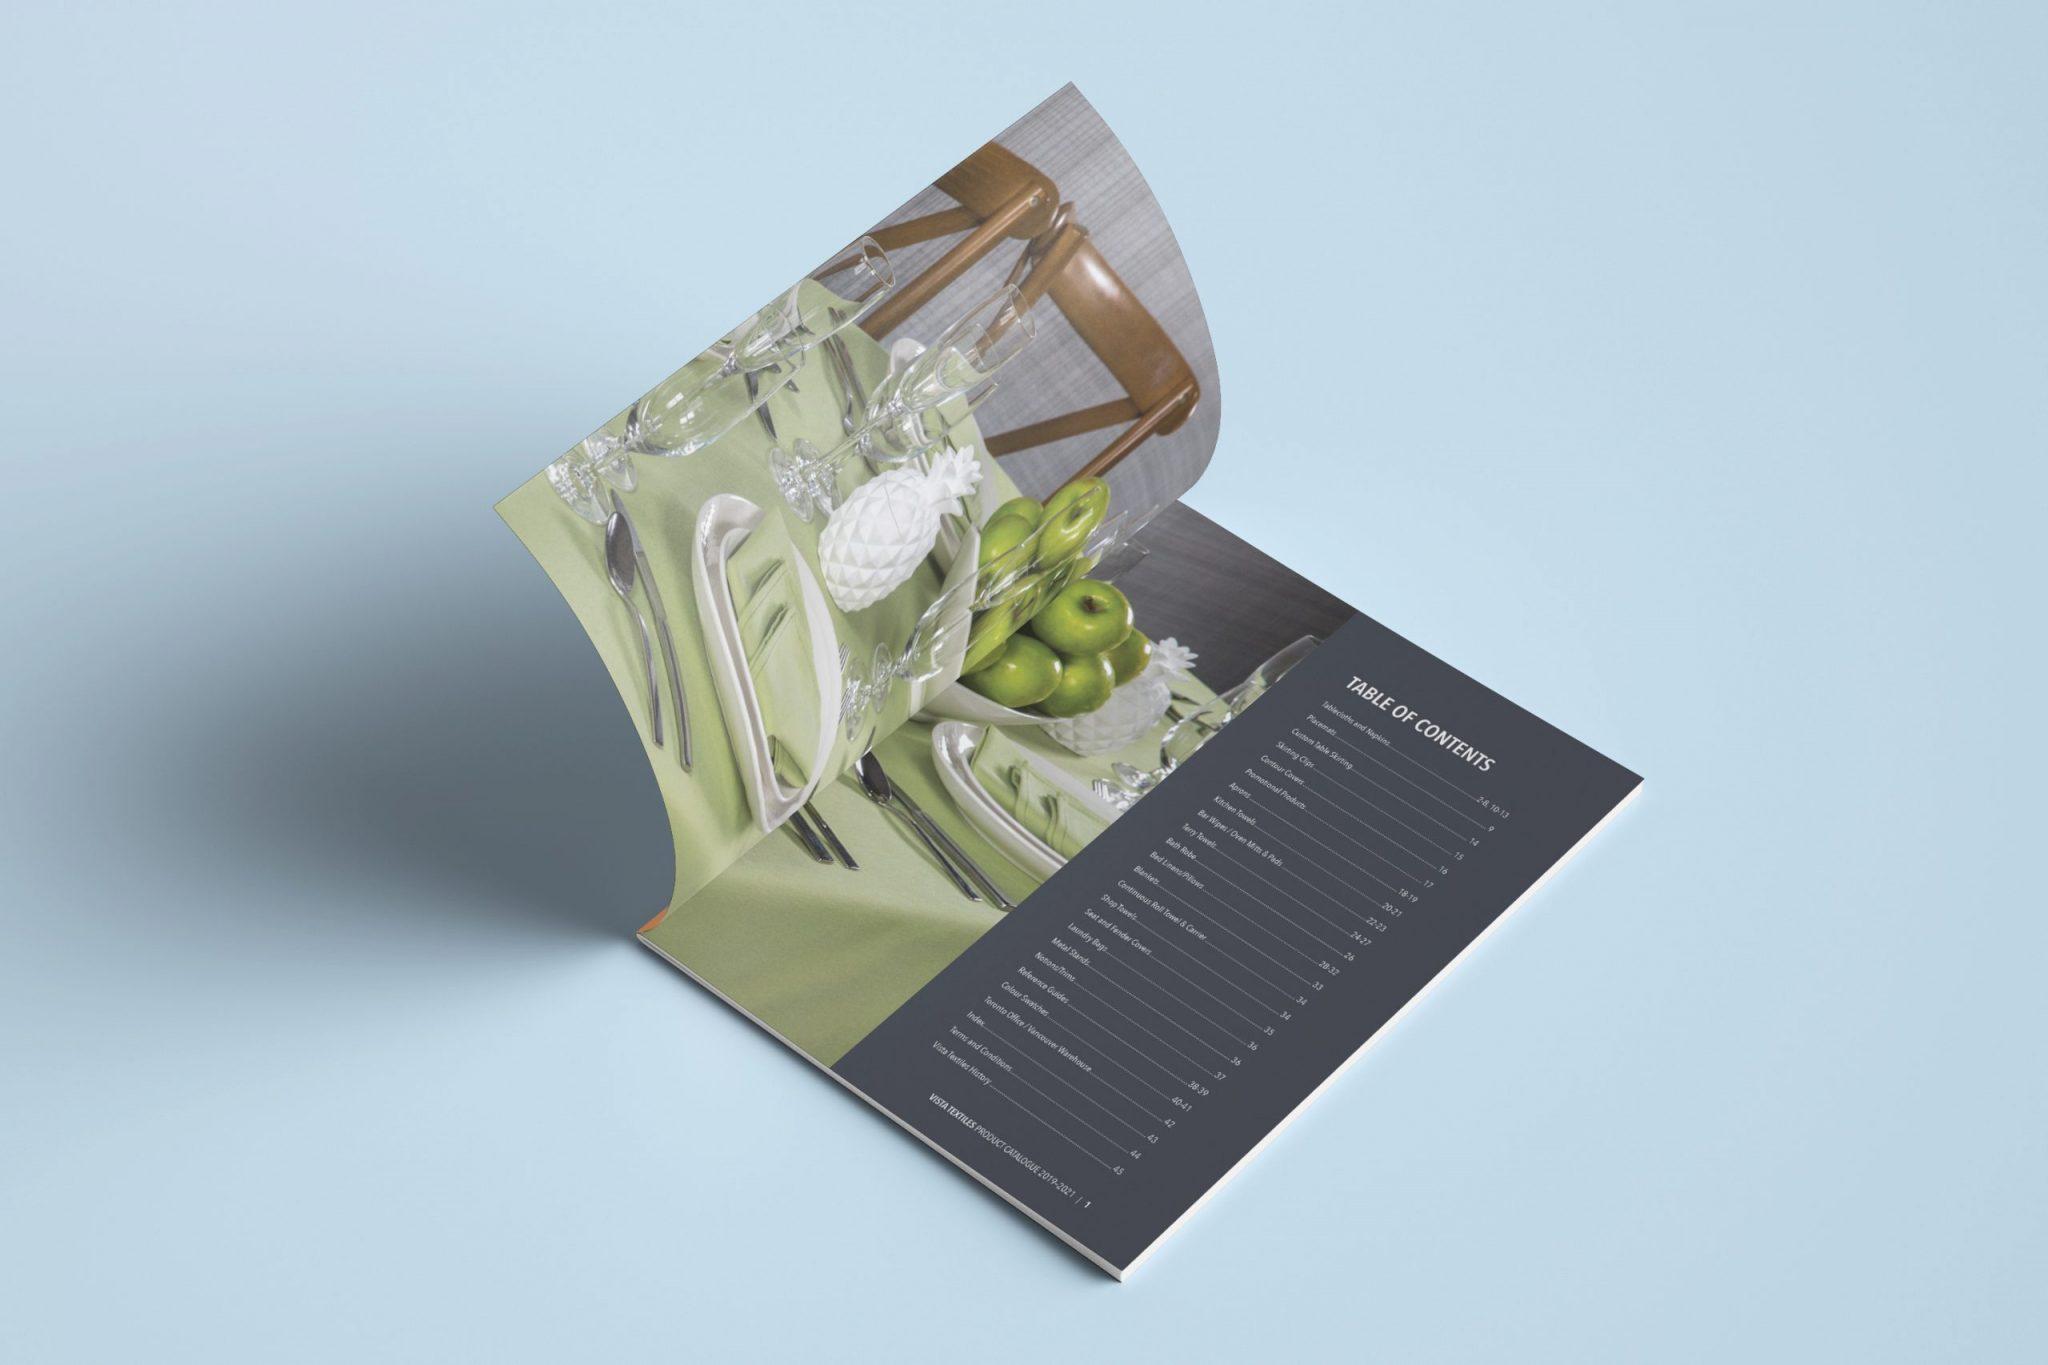 vista-textiles-catalog-spread-2